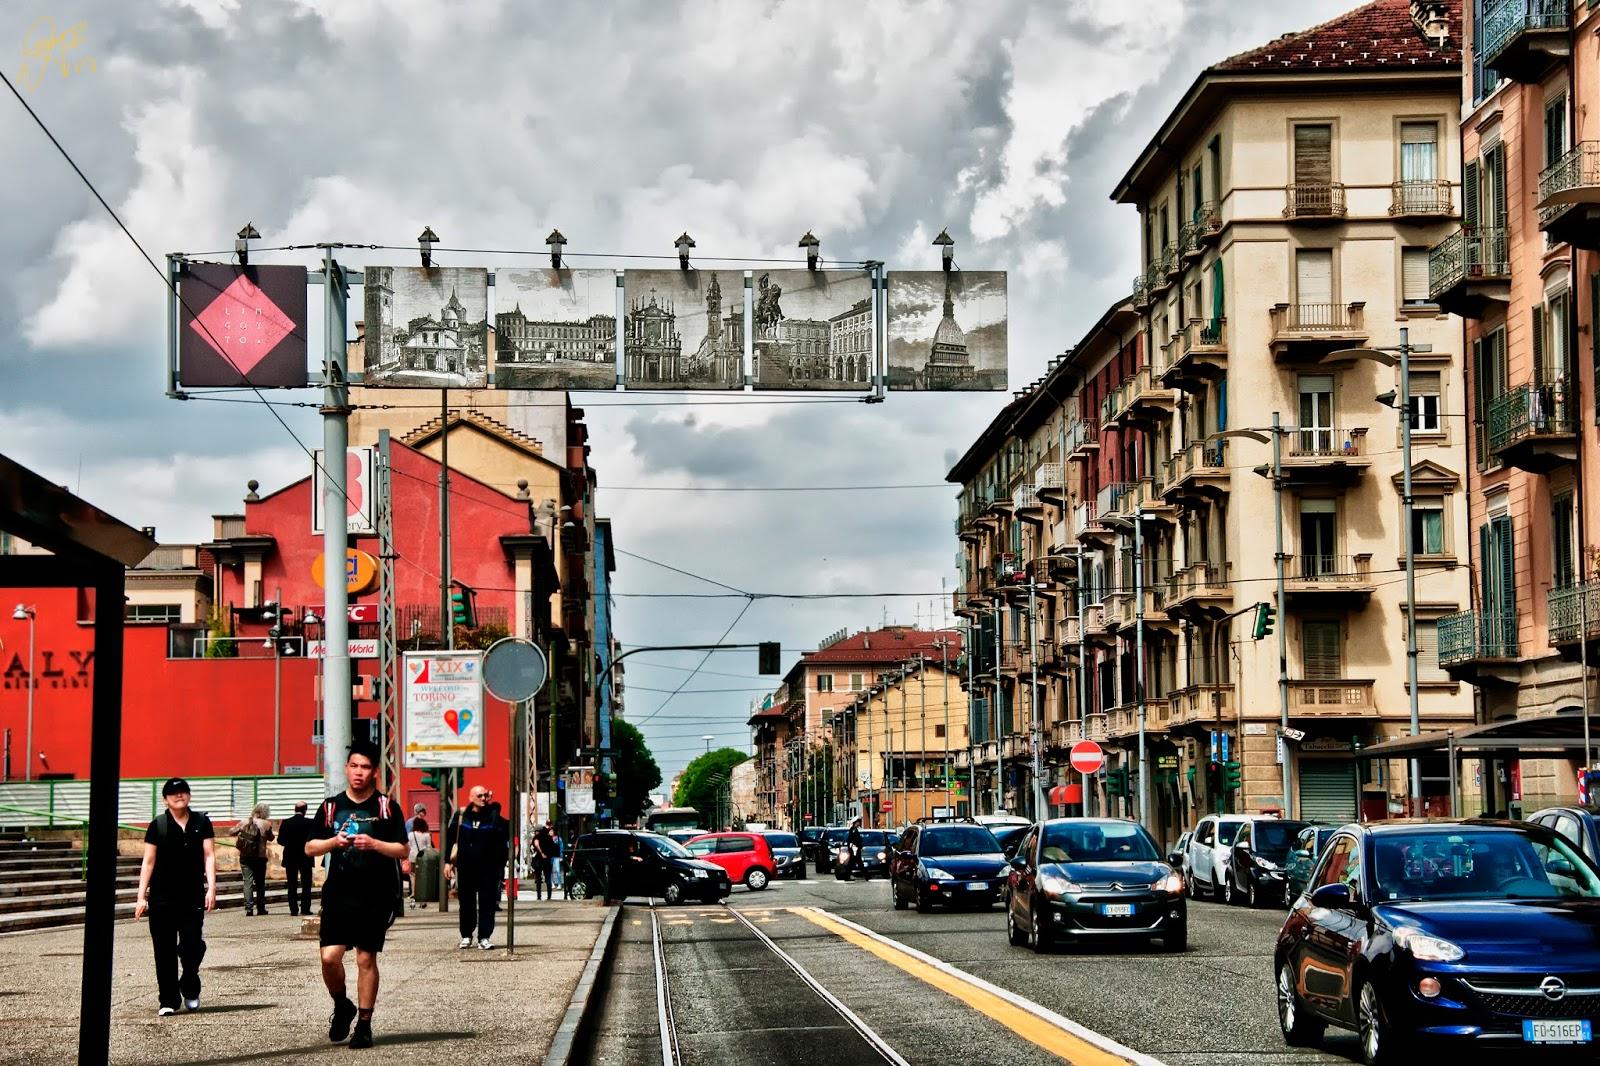 Hotel Nizza Via Nizza  Torino